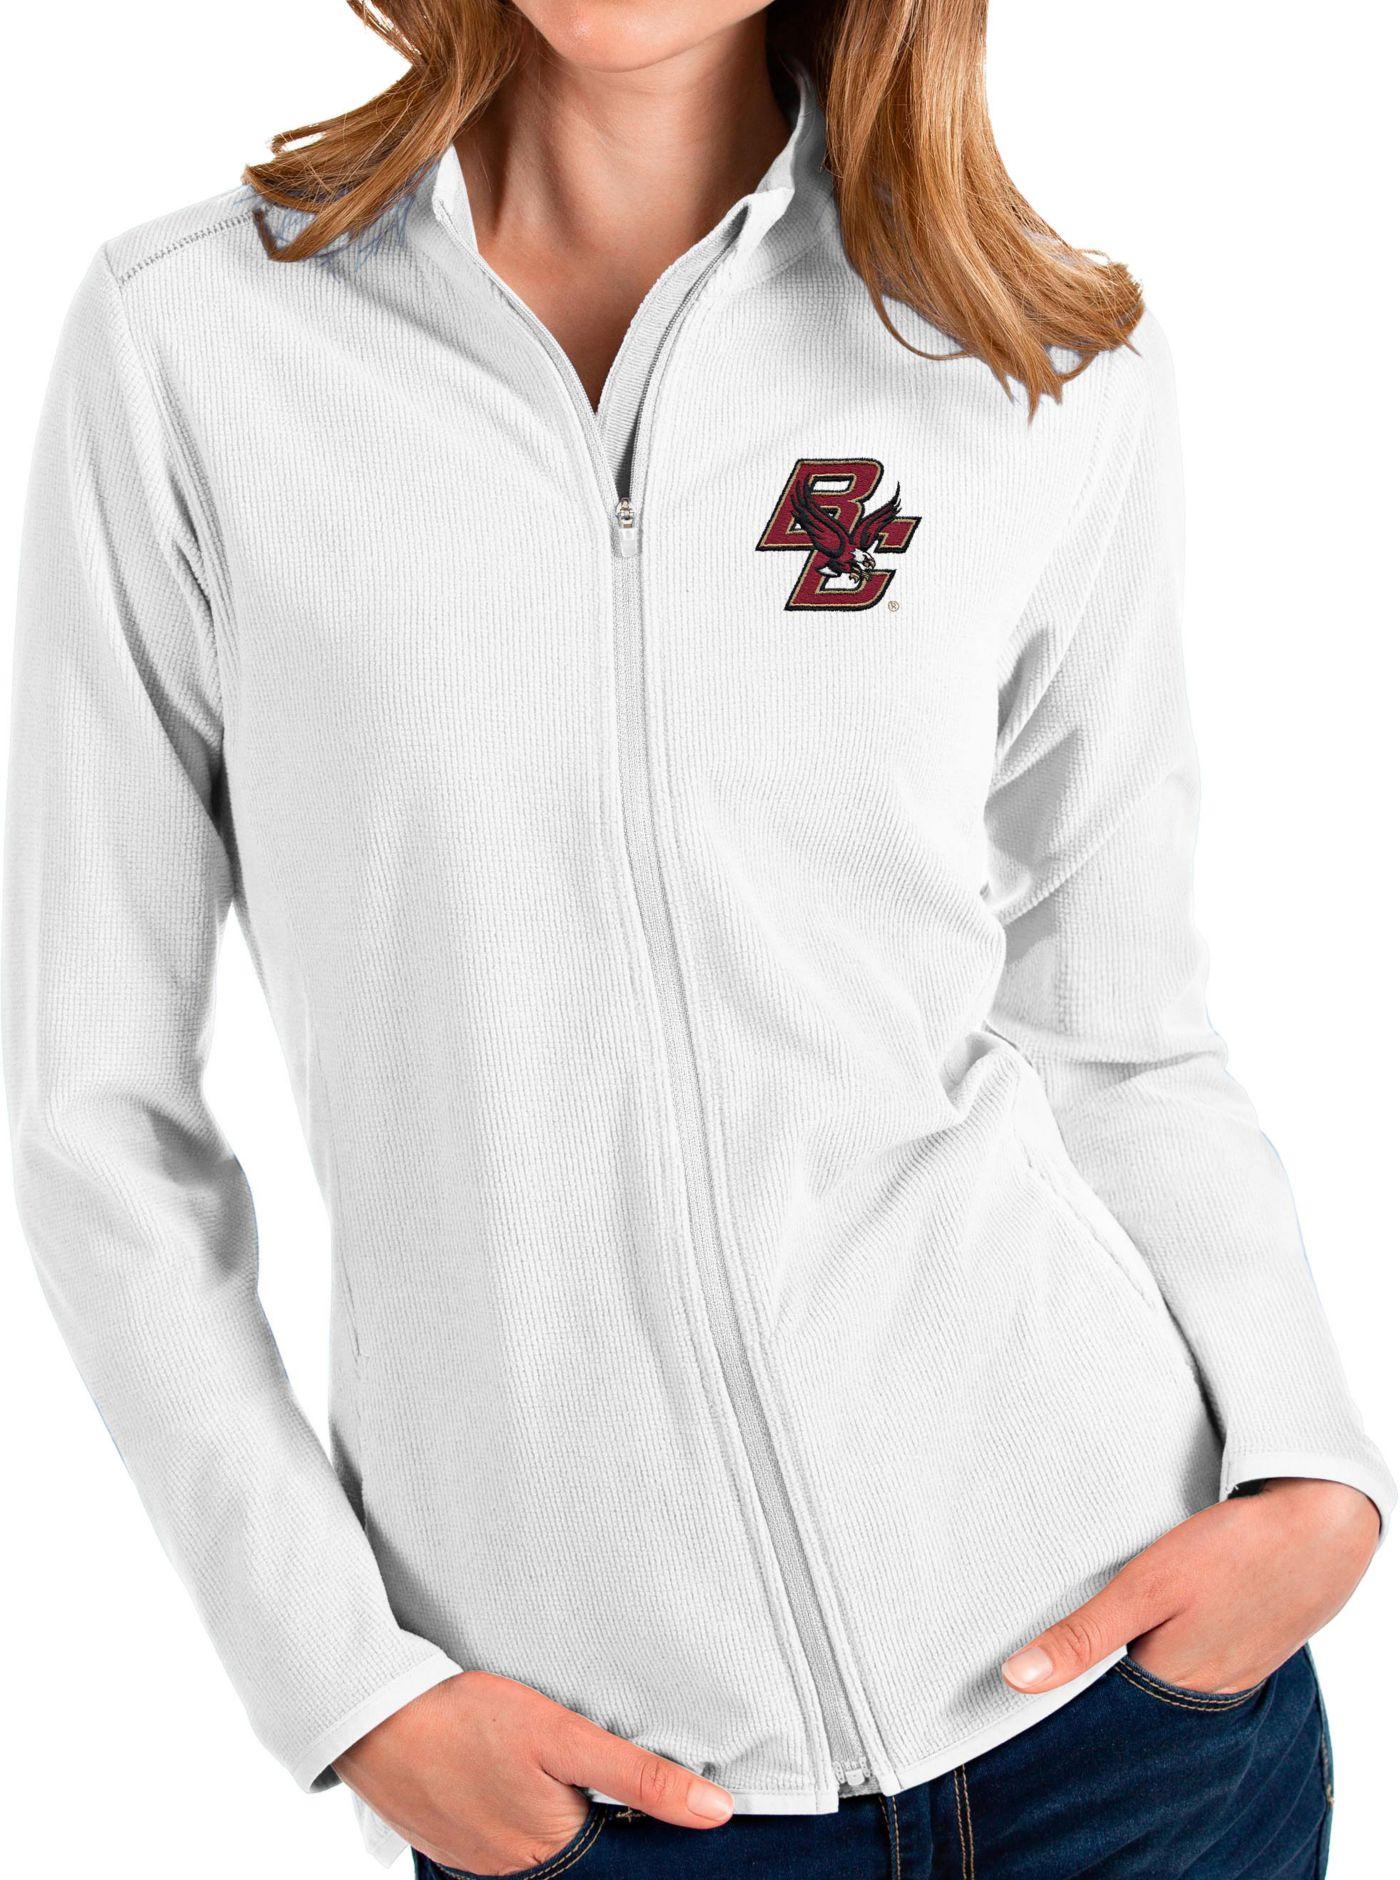 Antigua Women's Boston College Eagles Glacier Full-Zip White Jacket